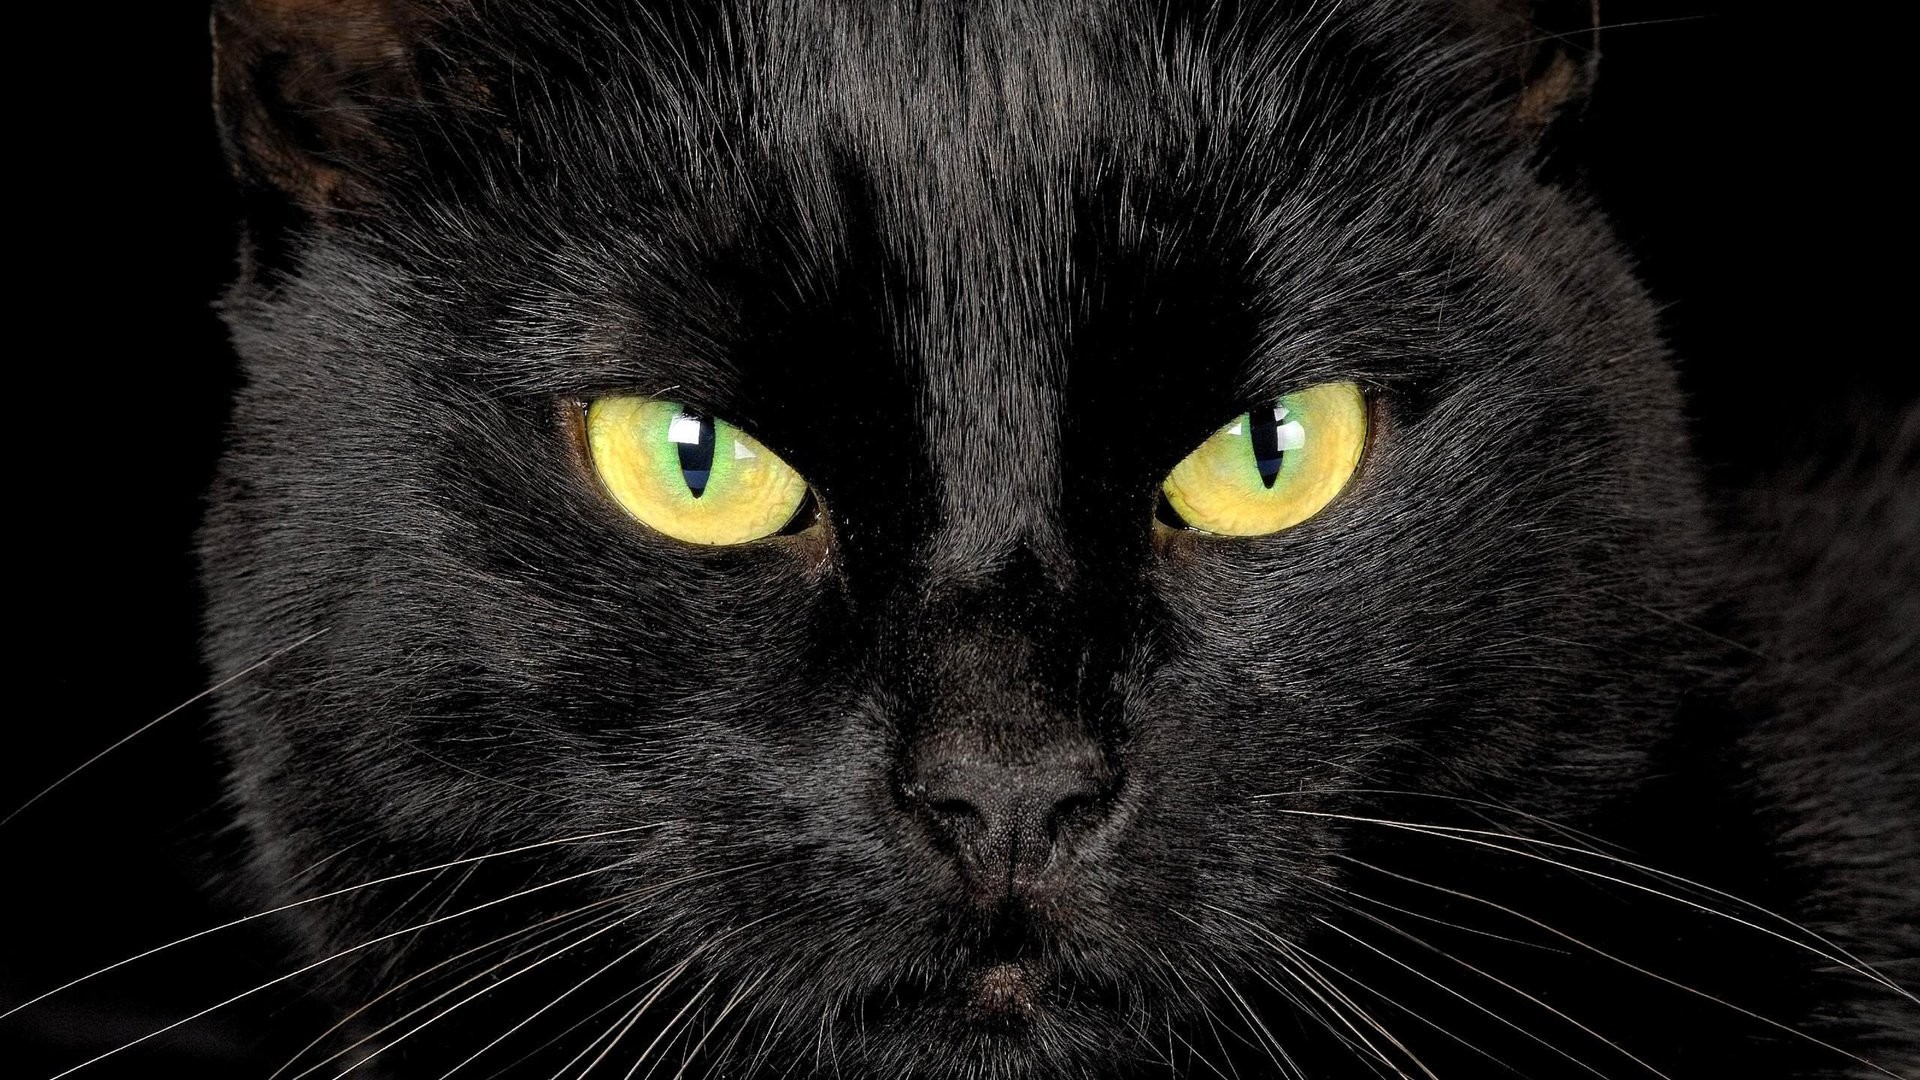 Black Cat picture wallpaper